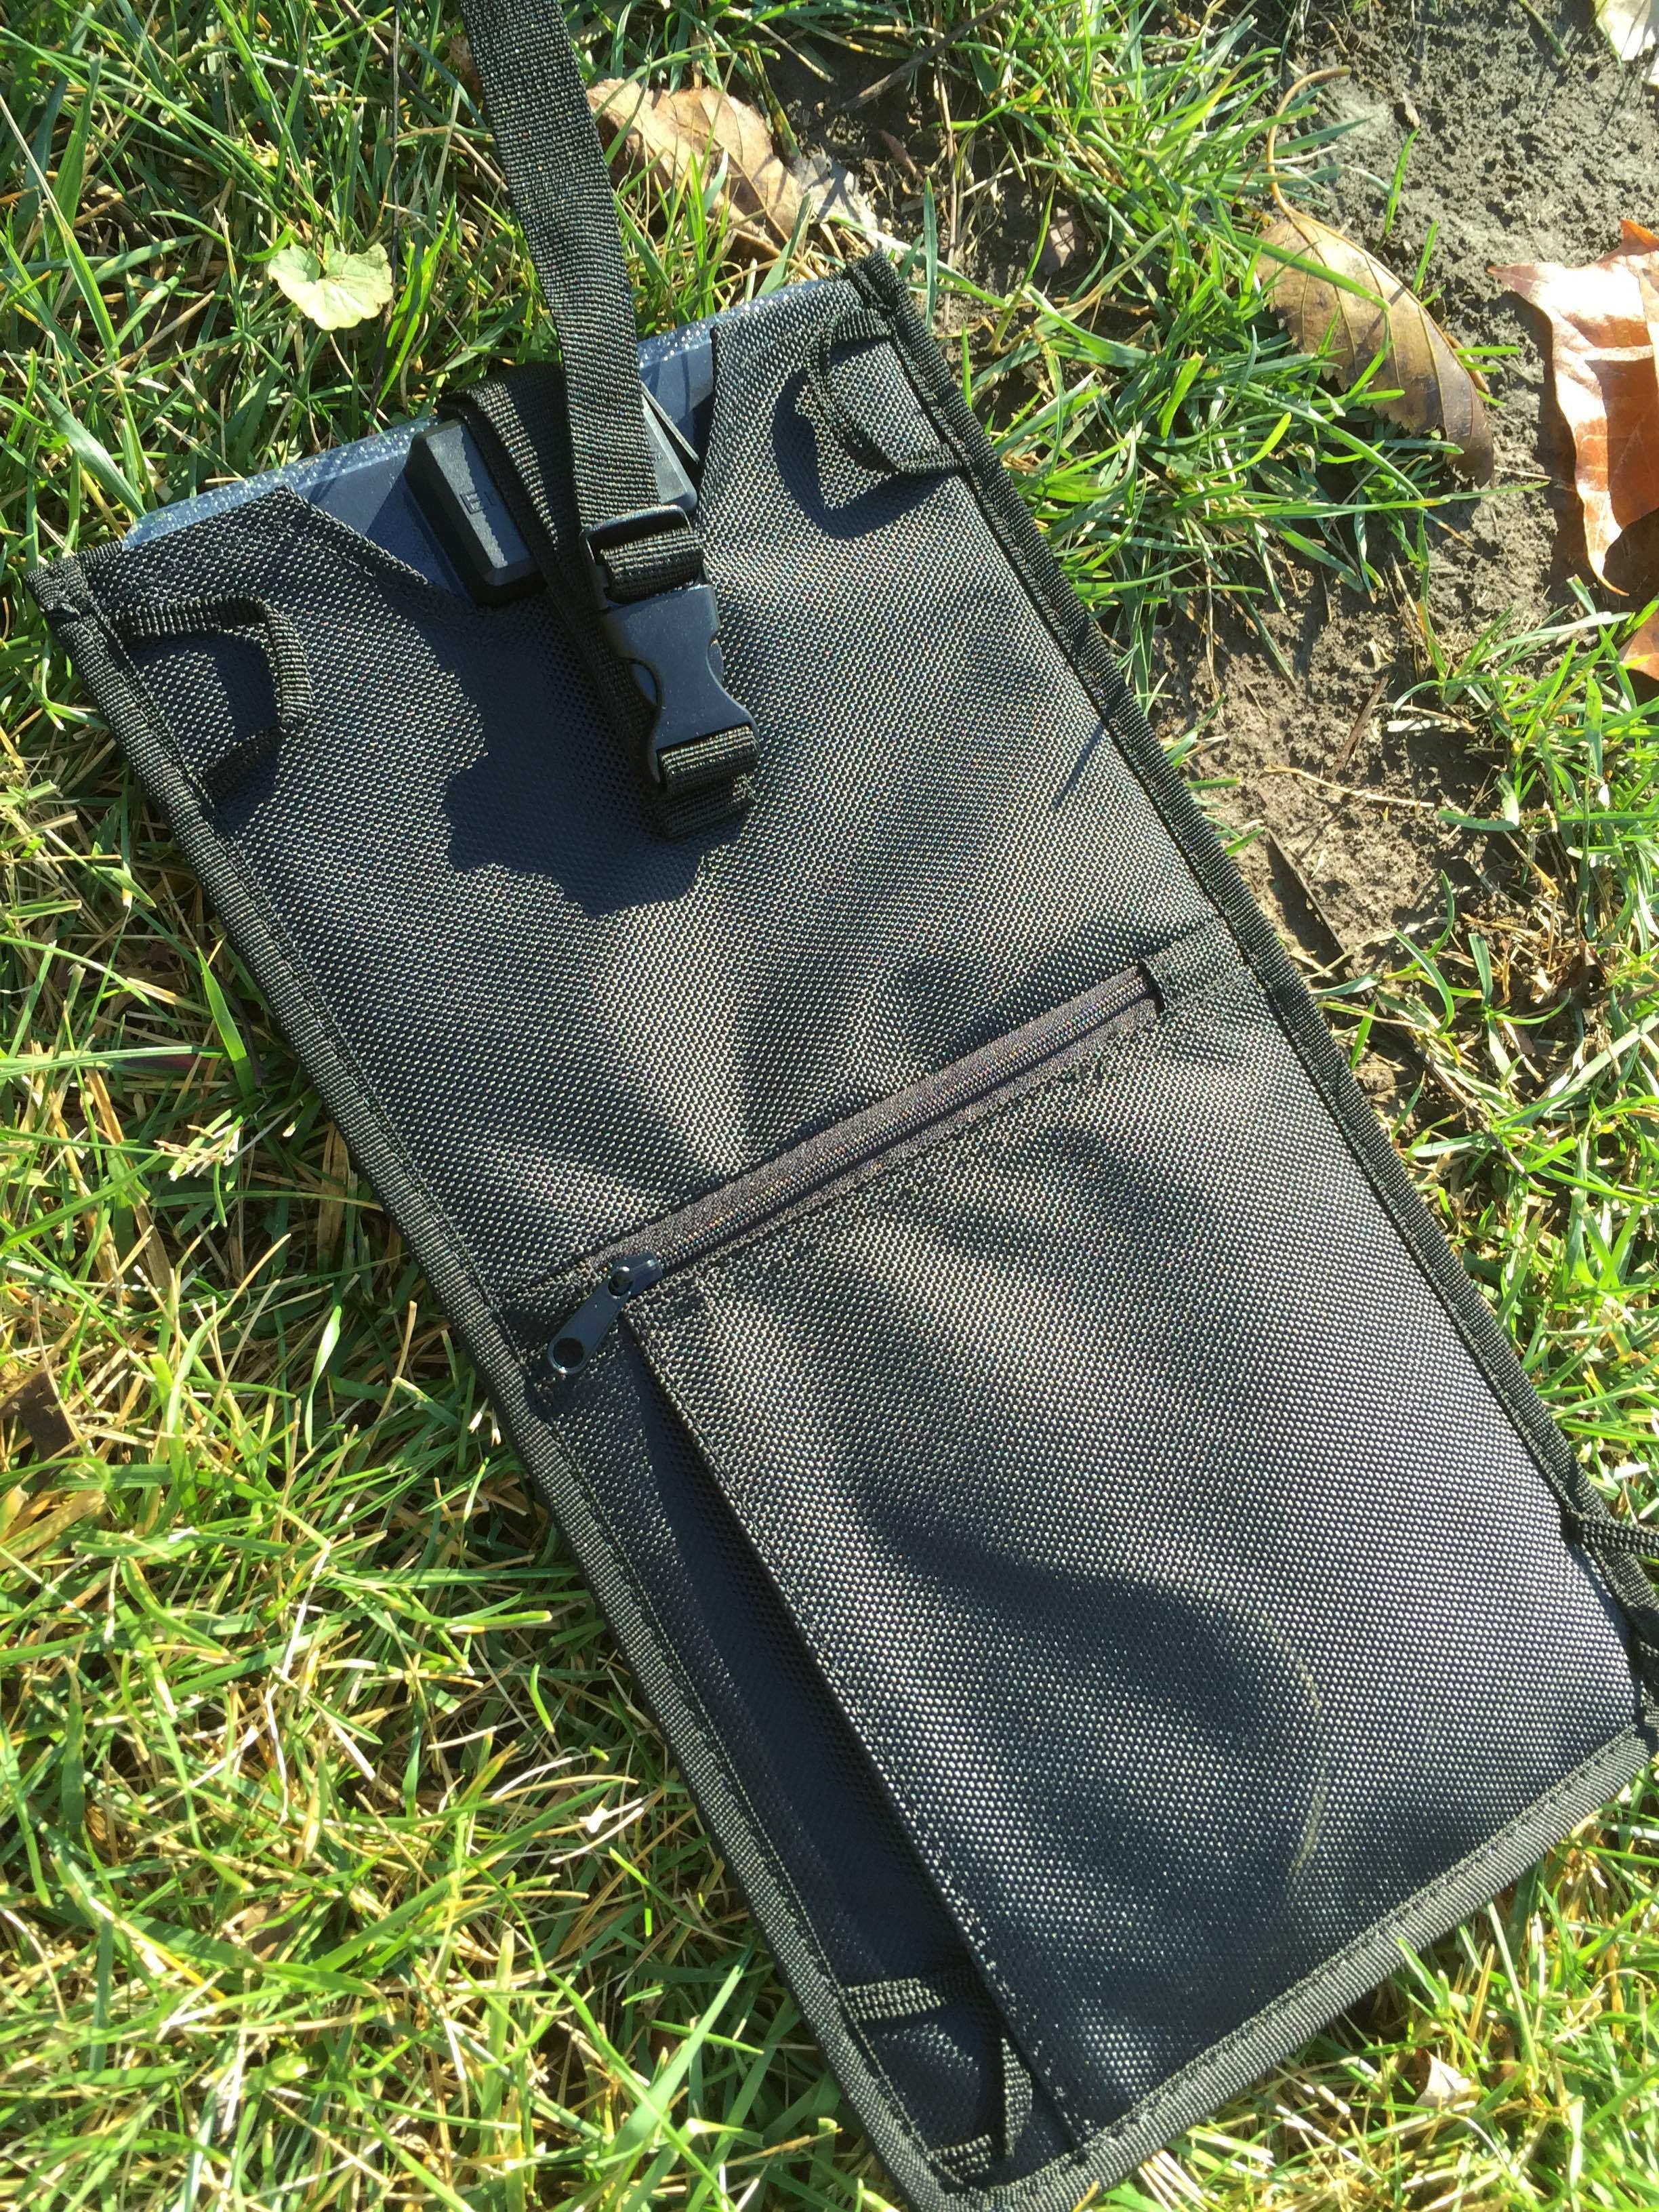 EnerPlex Kickr II Portable Solar Charger